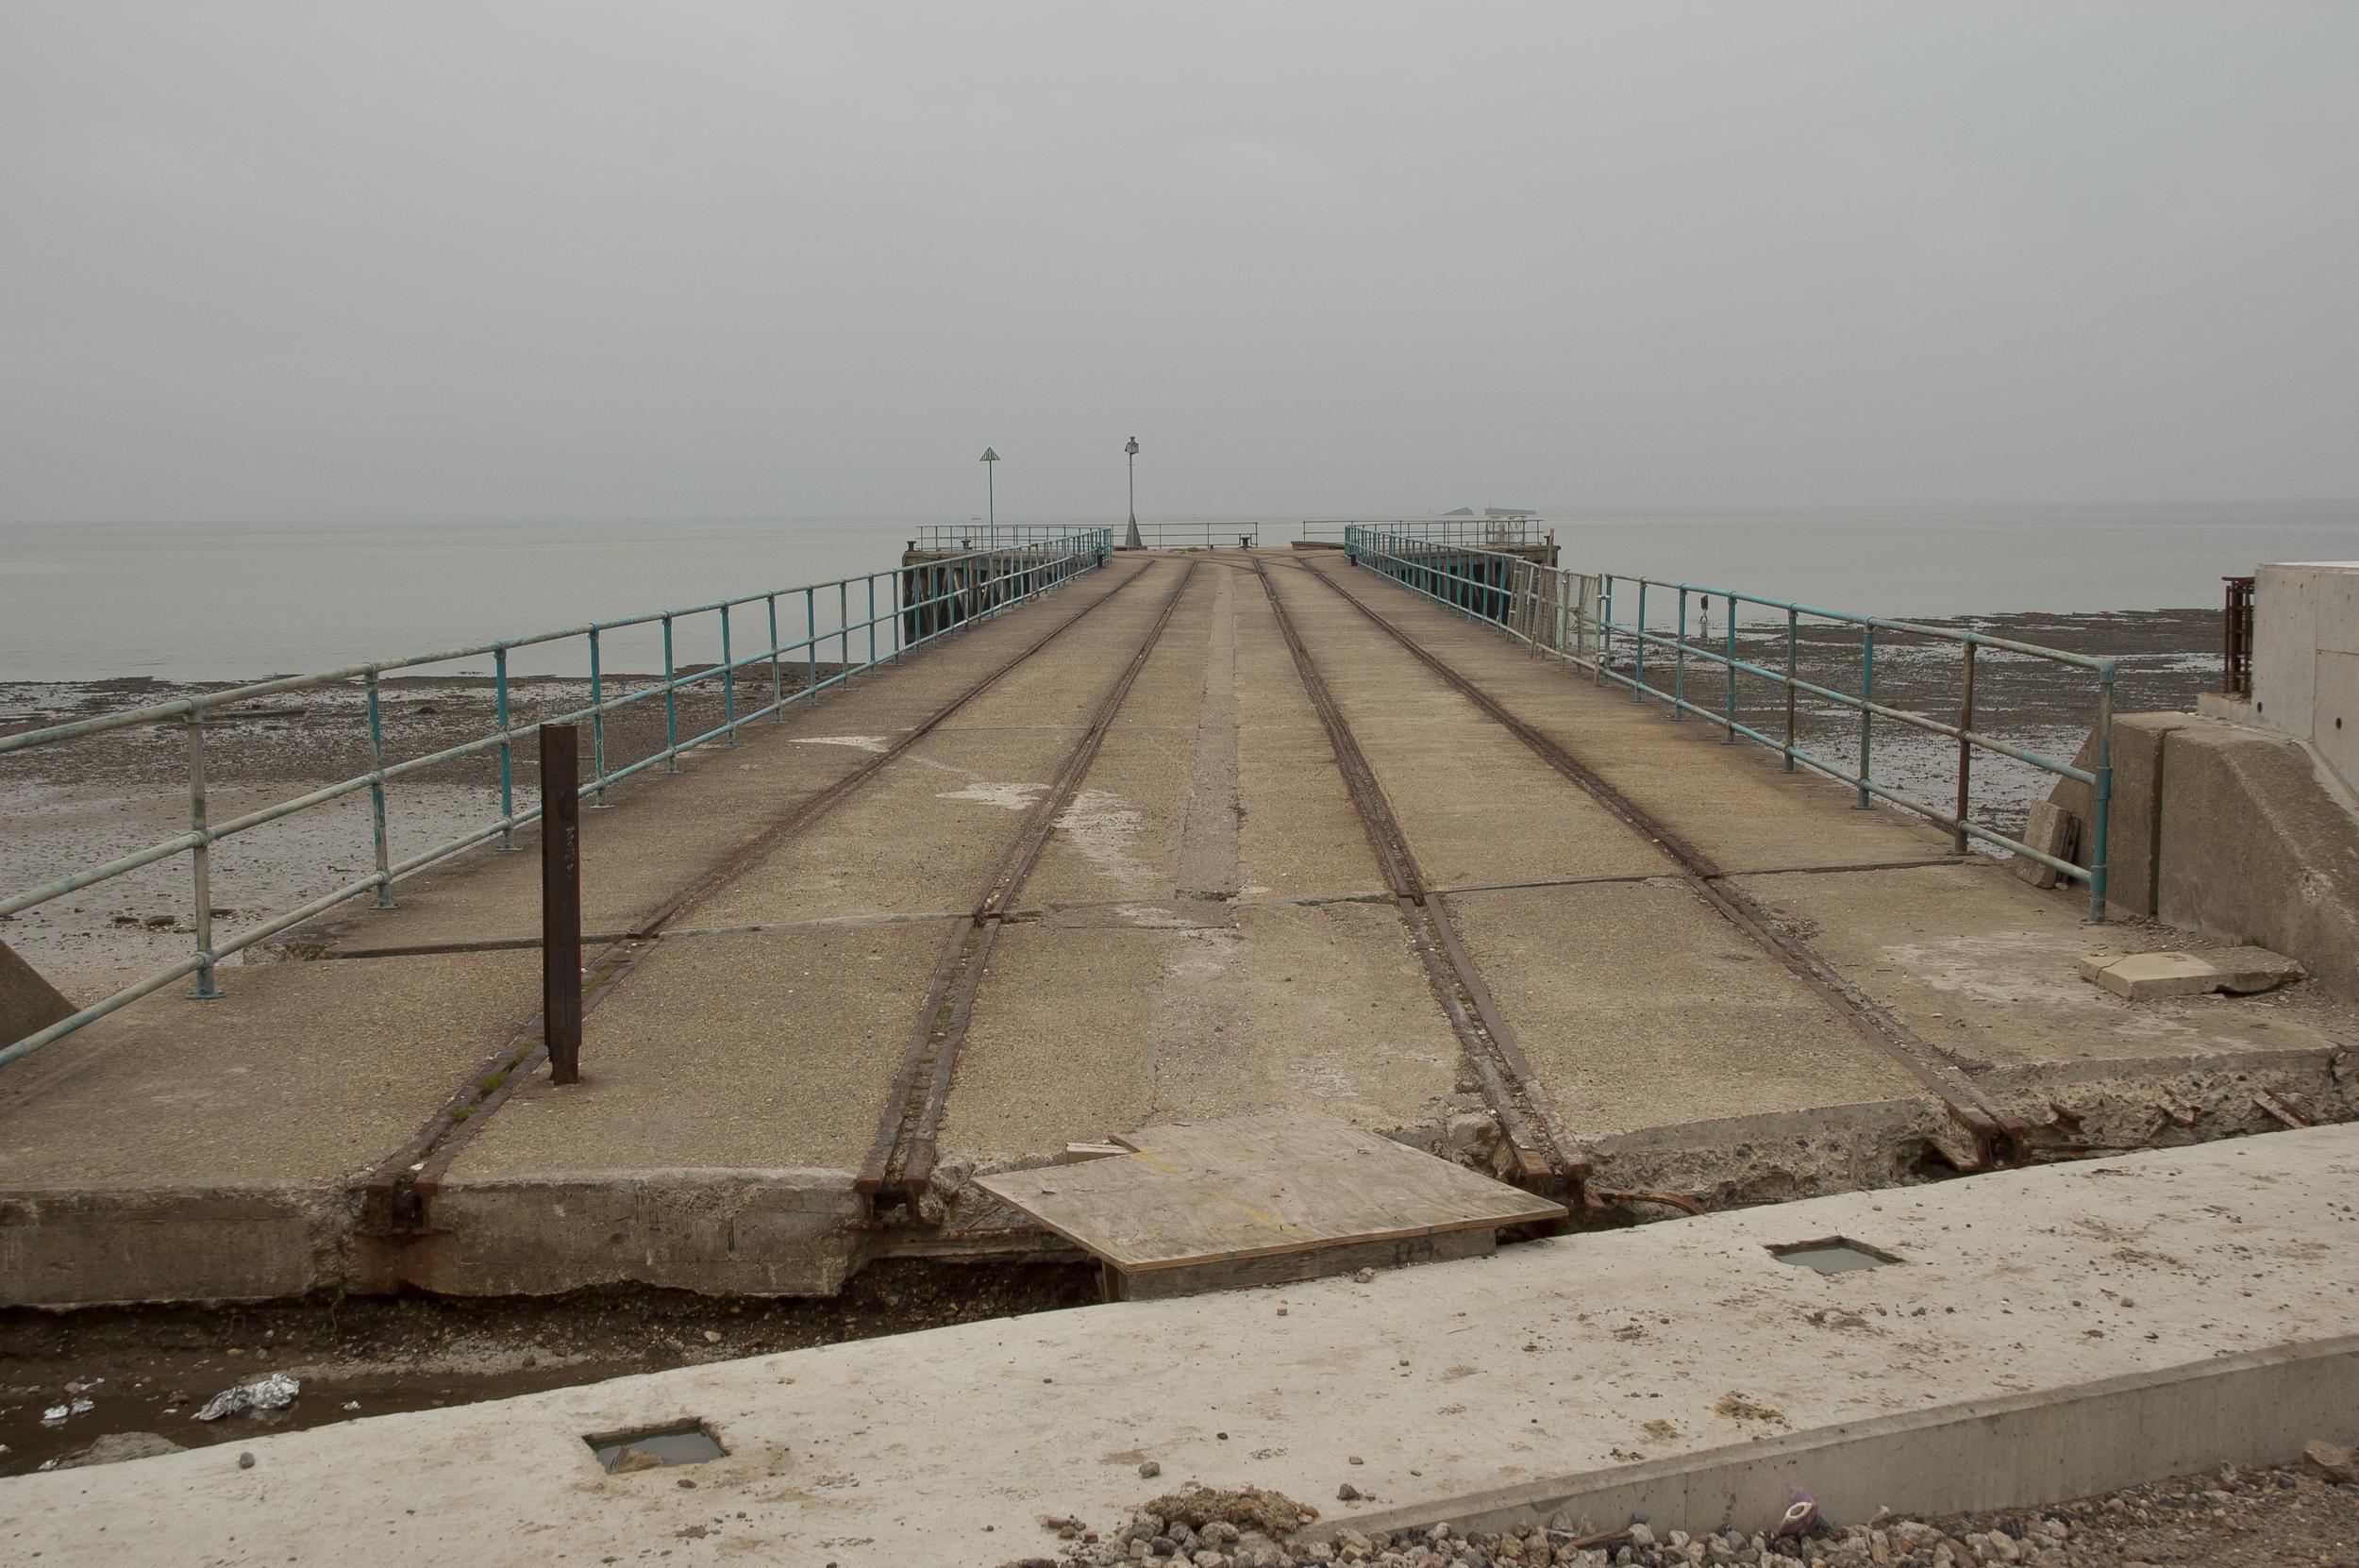 Garrison Pier 2, Shoeburyness,  digital C-print, 2008